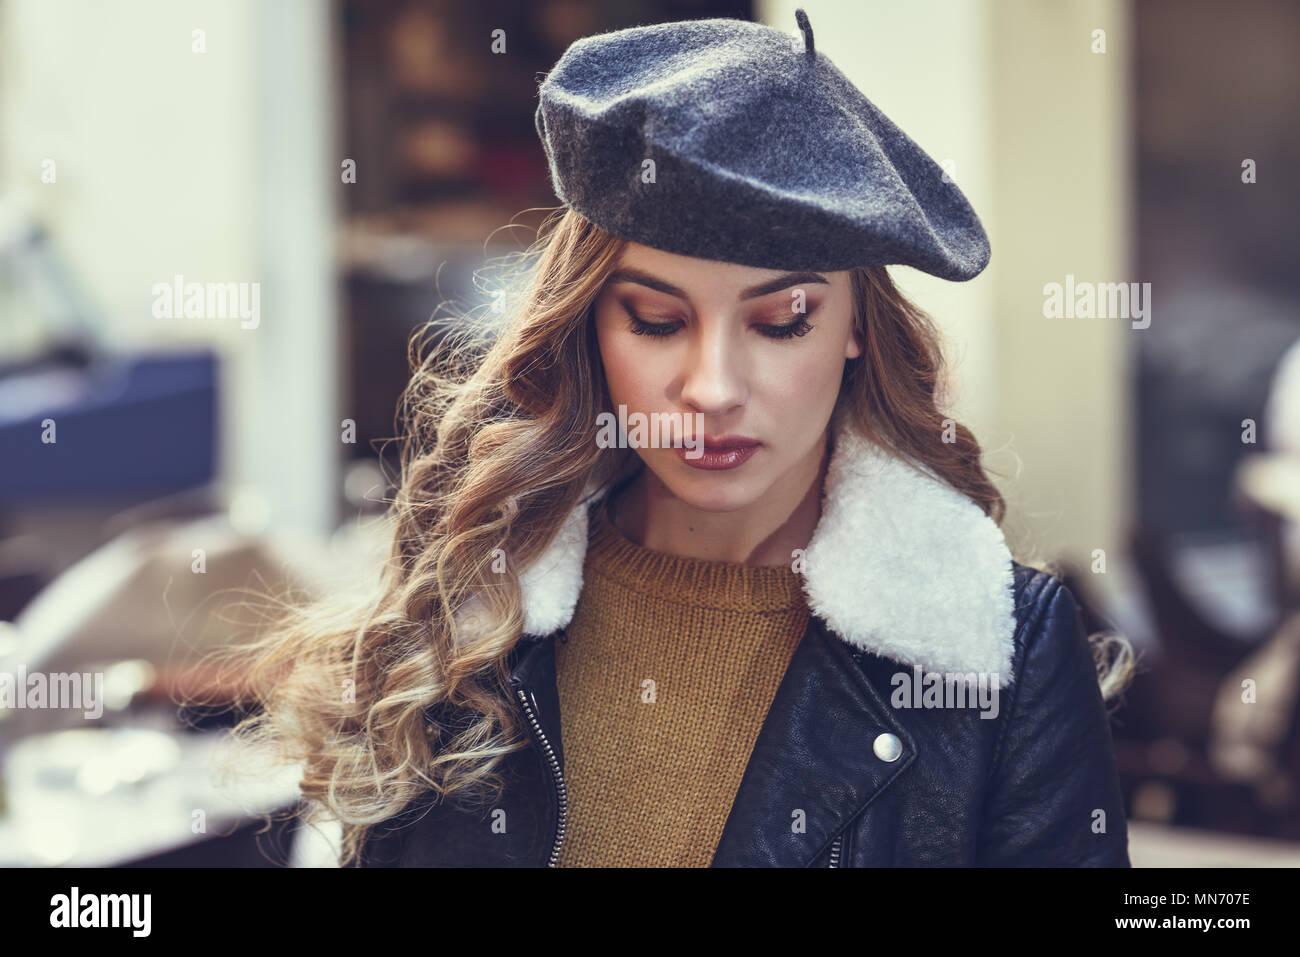 Bionda donna russa in background urbano. Bellissima fanciulla indossando  beret dc378a40fd2